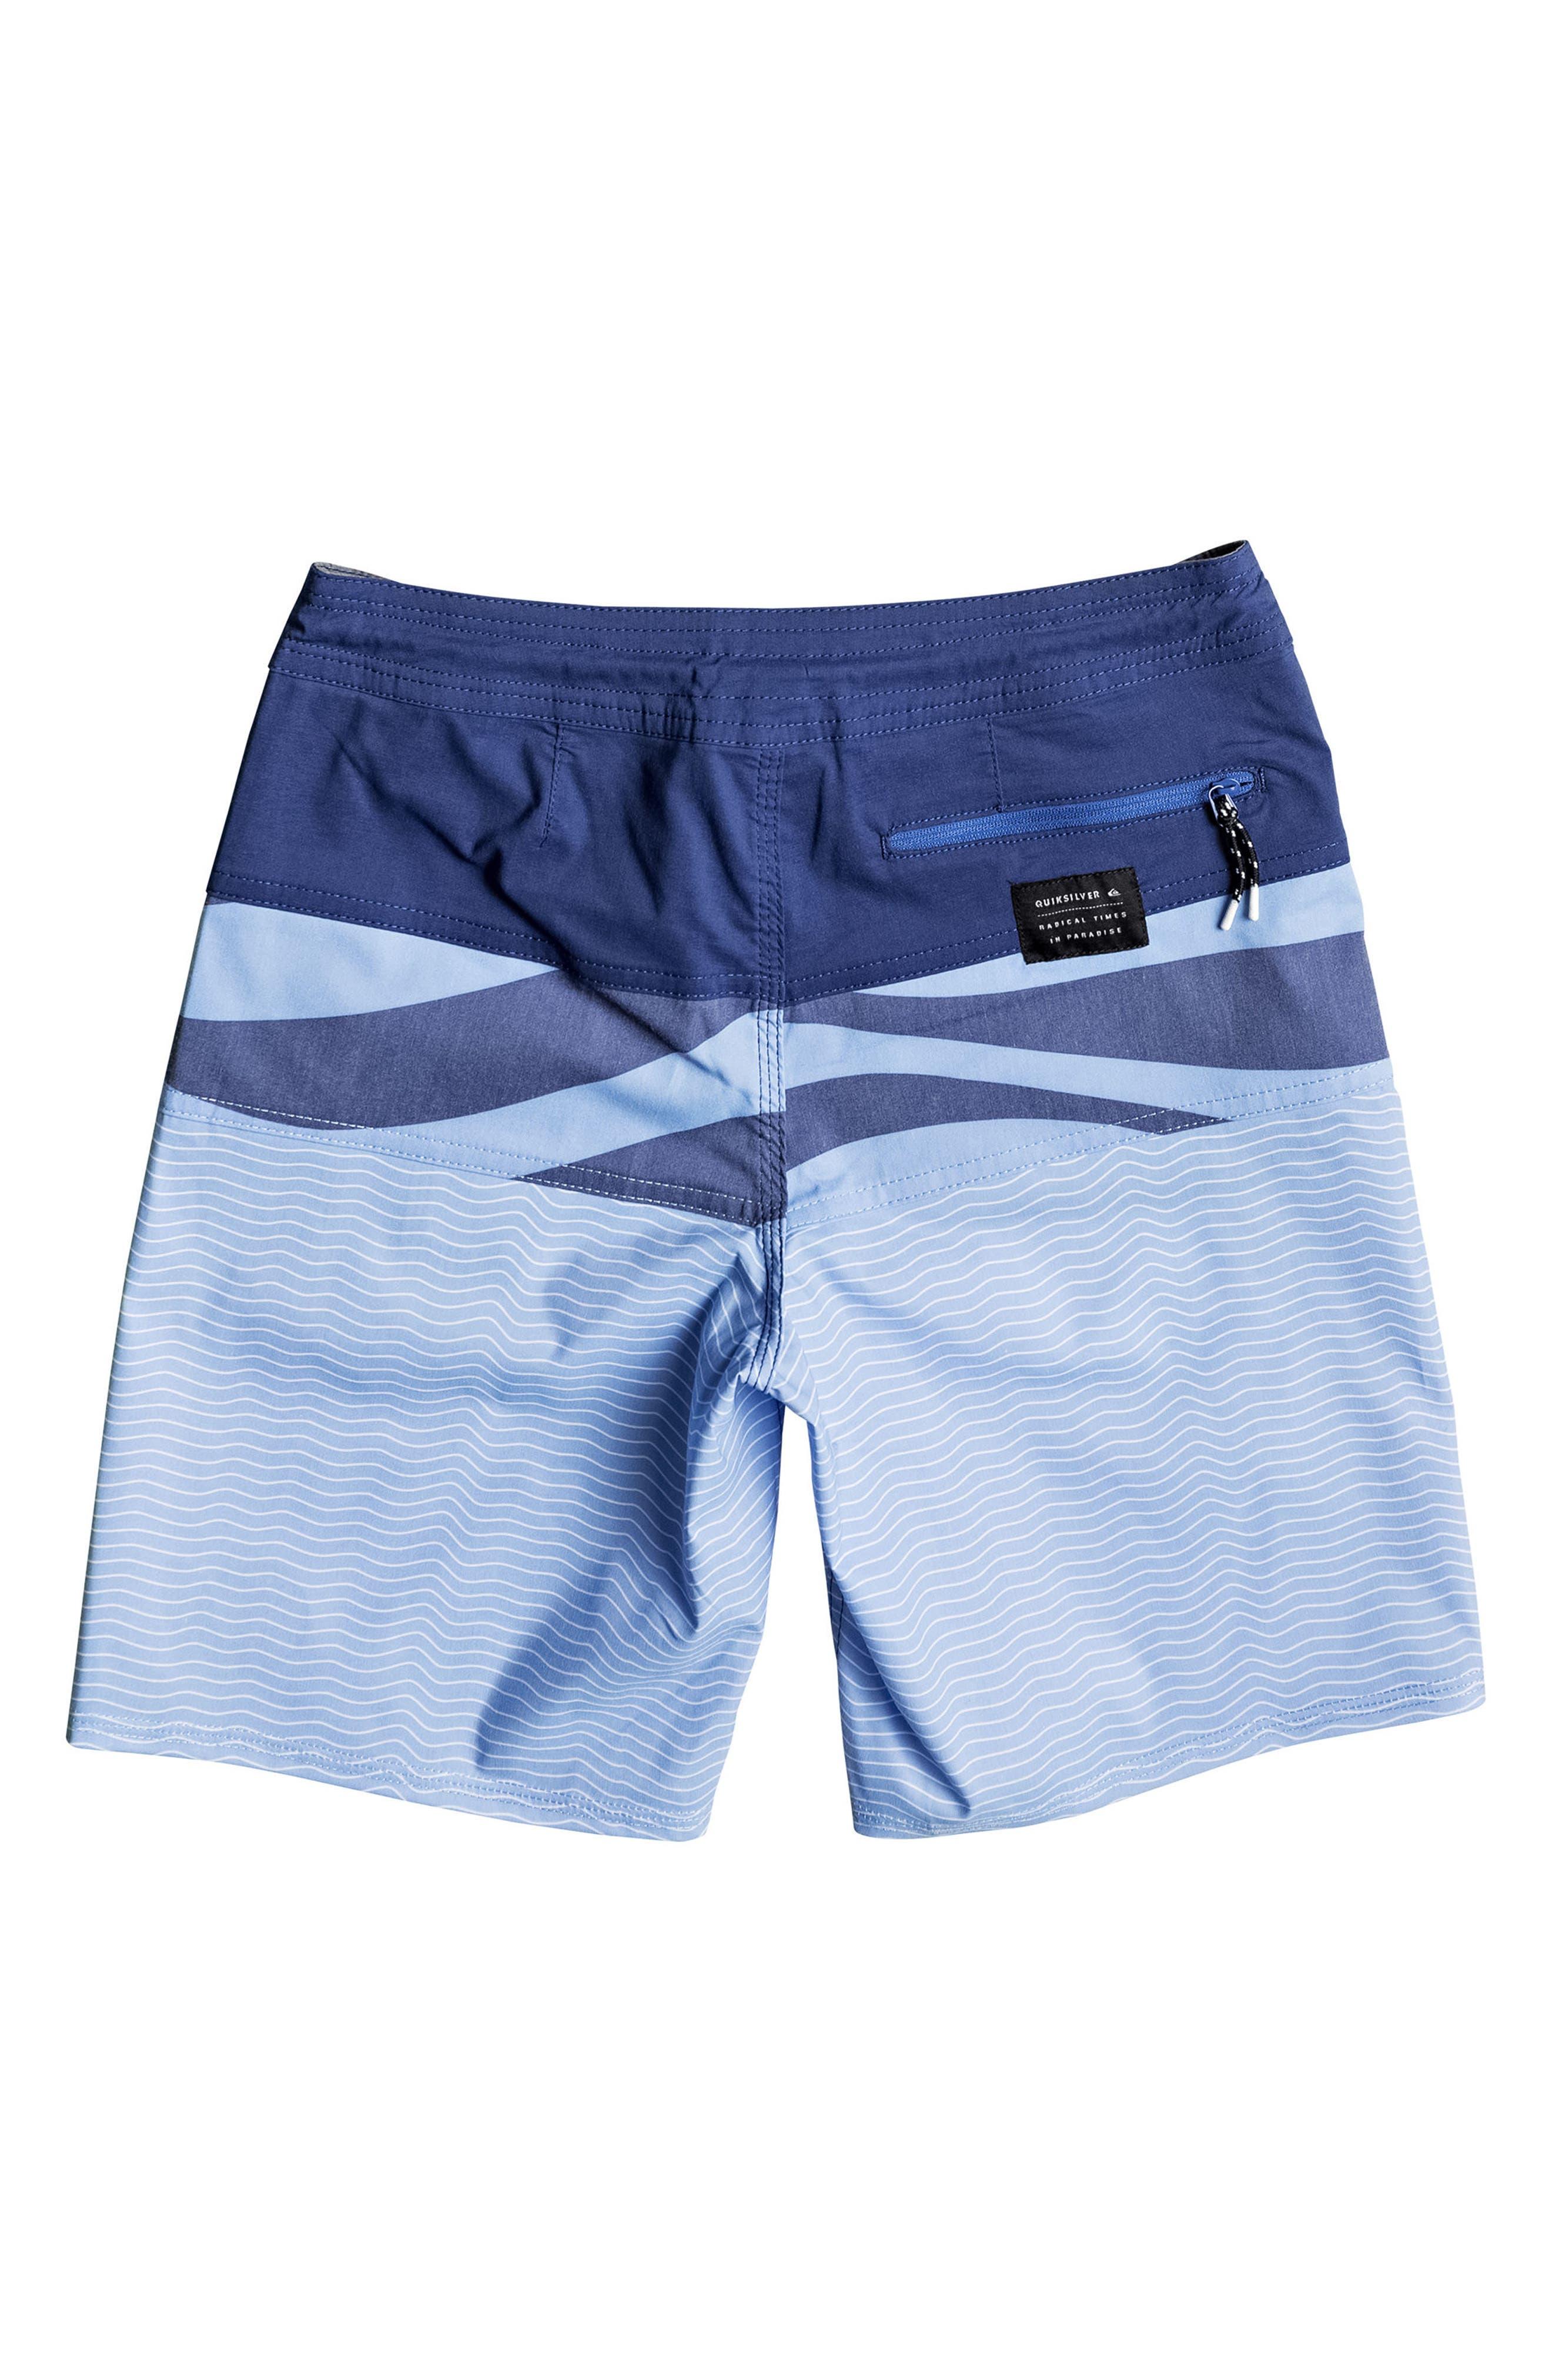 Heatwave Blocked Beach Shorts,                             Alternate thumbnail 4, color,